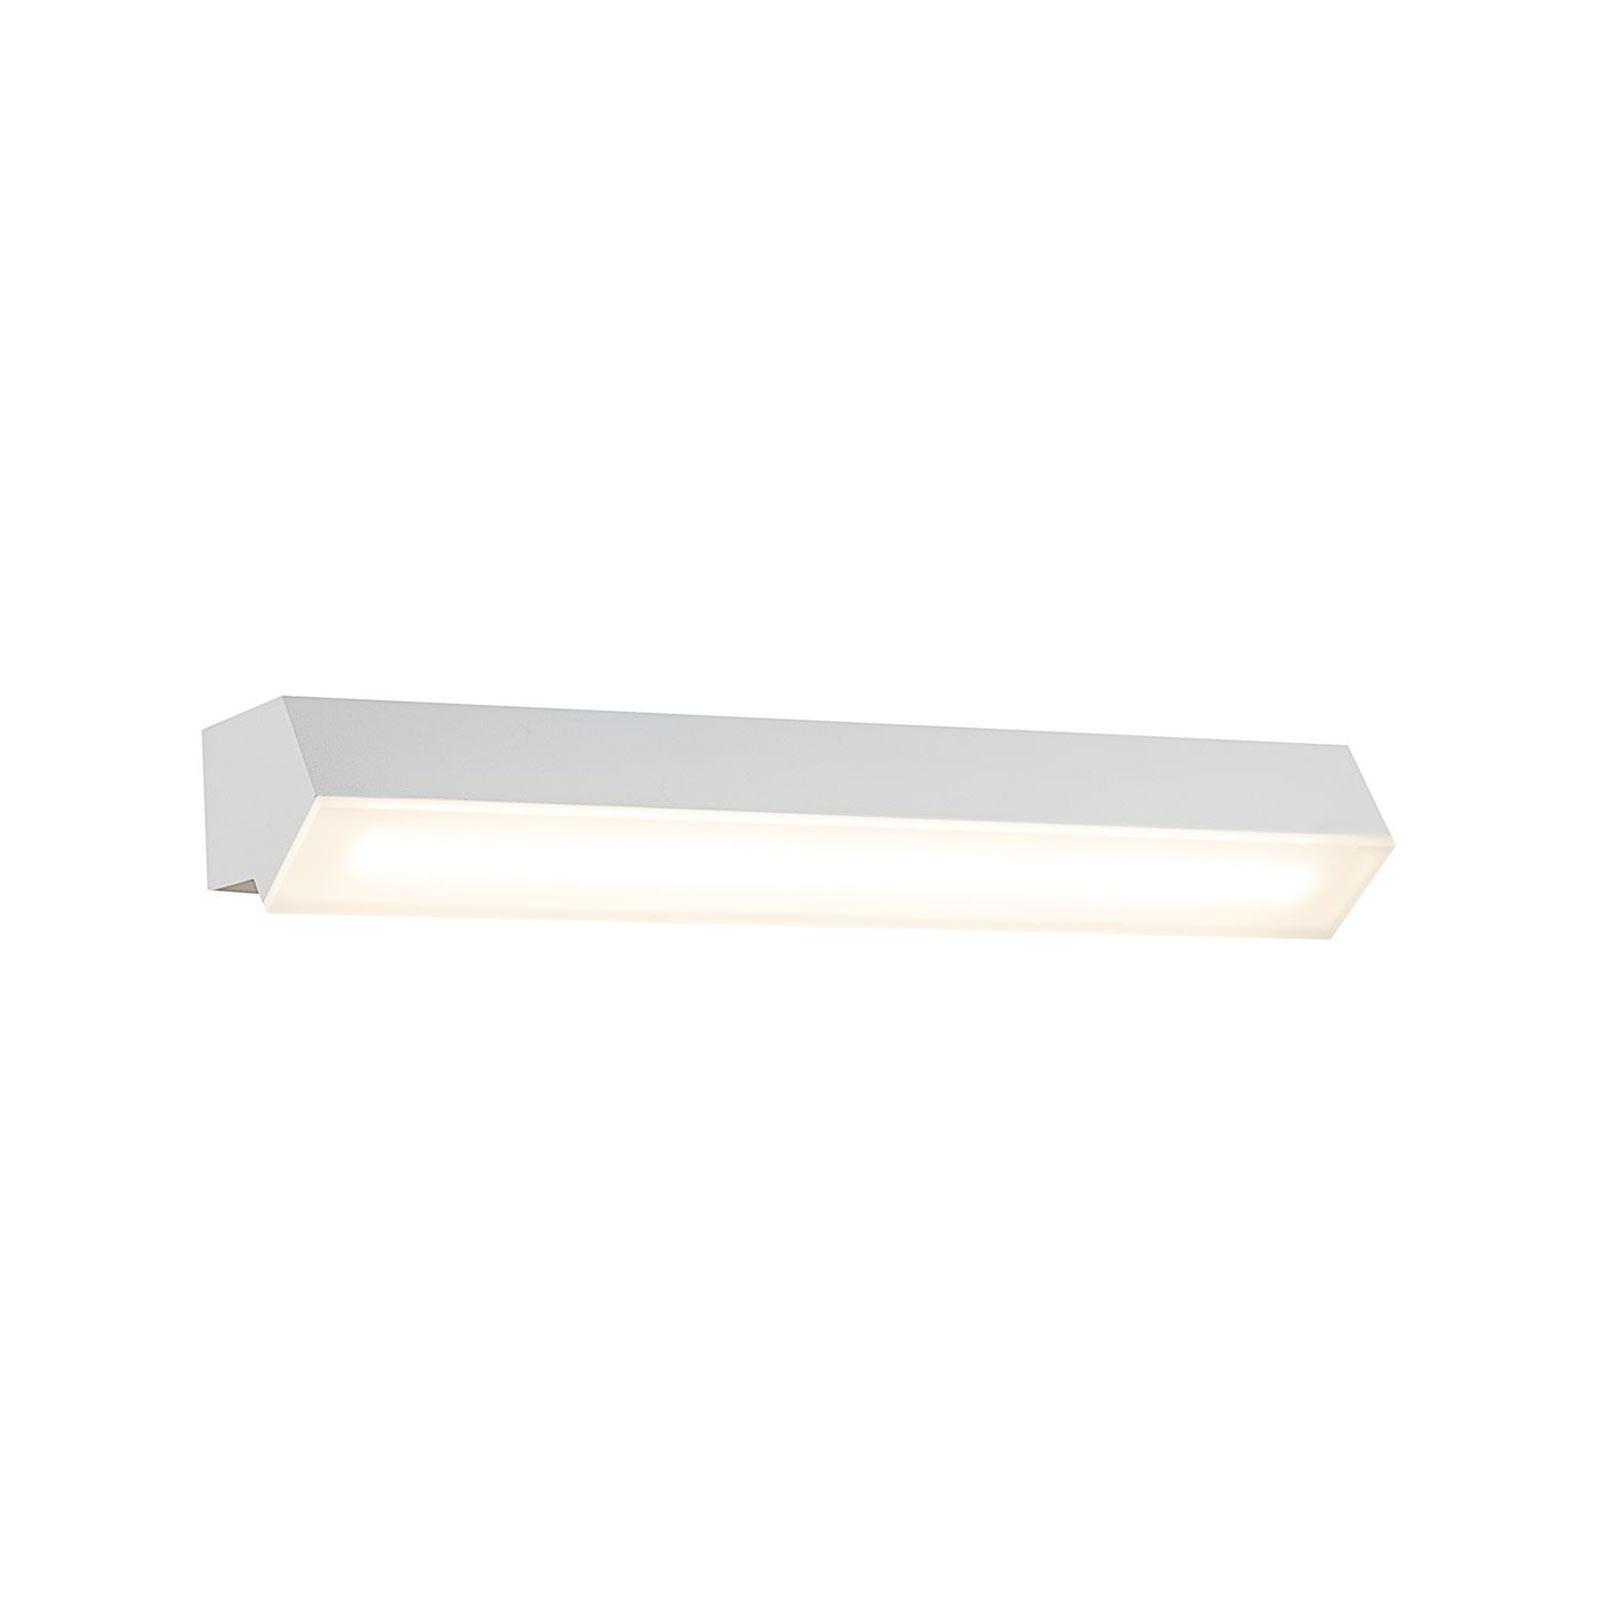 LED-seinävalaisin Toni, leveys 37 cm